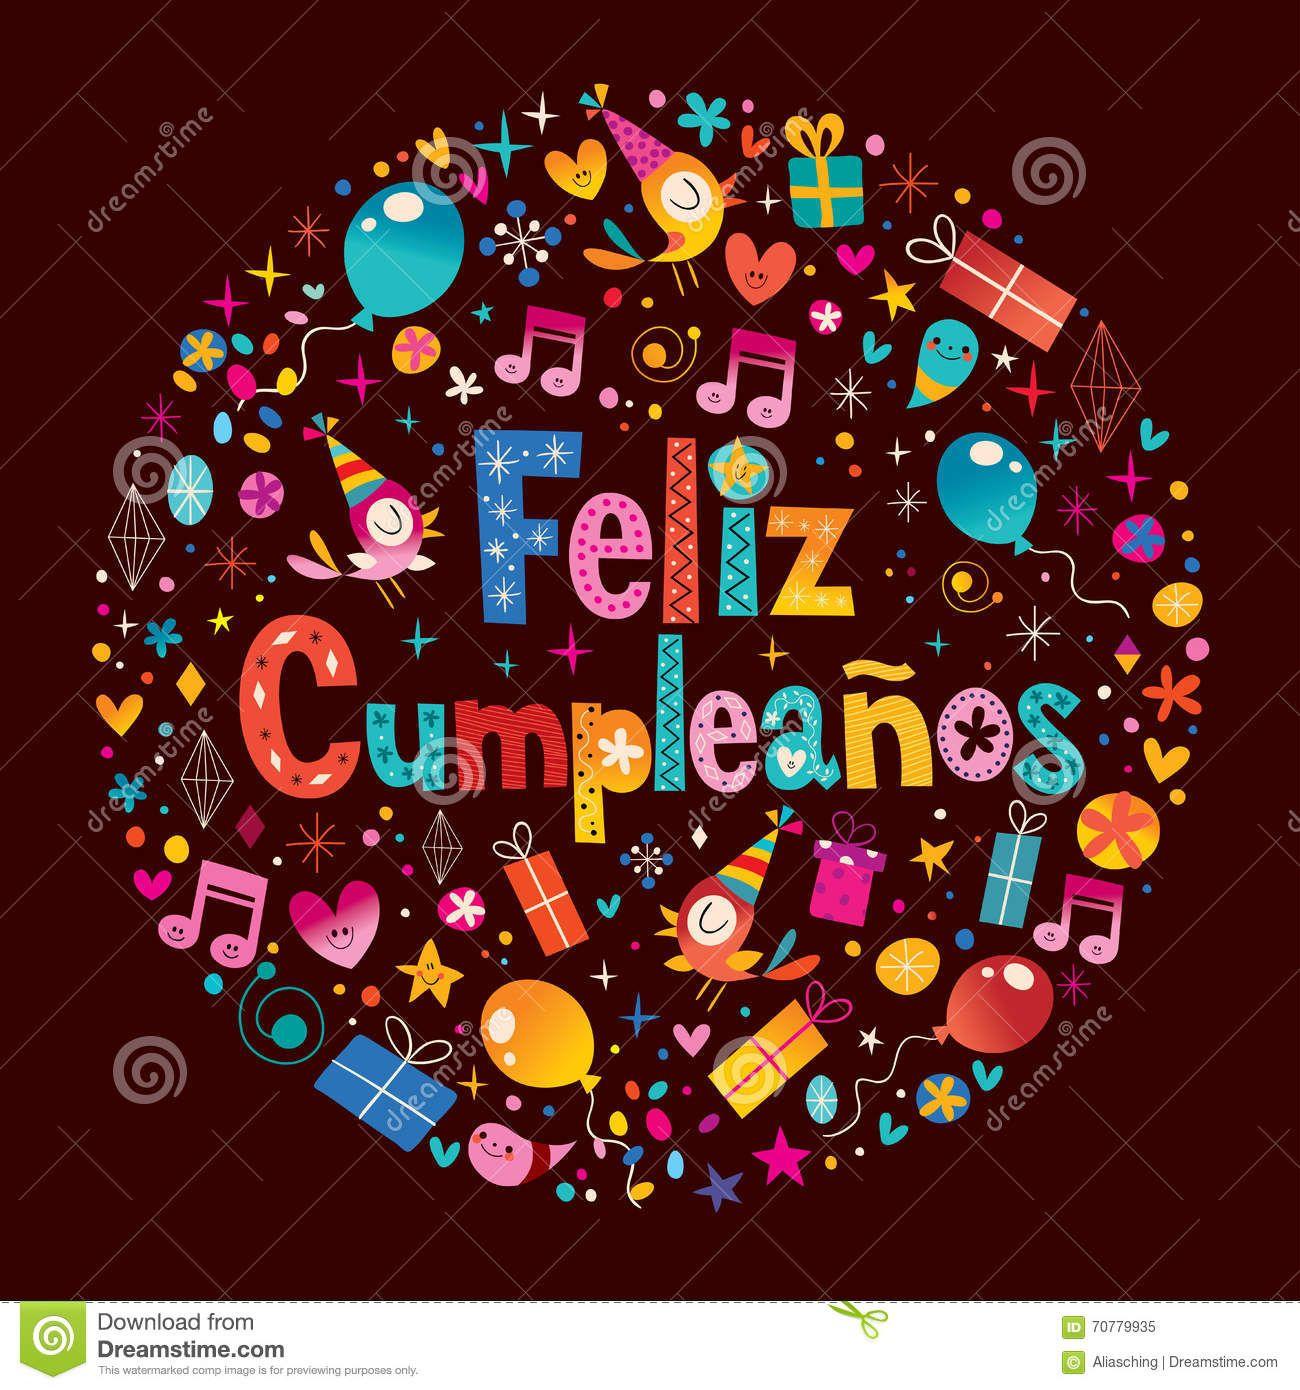 Feliz Cumpleanos Happy Birthday In Spanish Greeting Card – Spanish Birthday Greetings